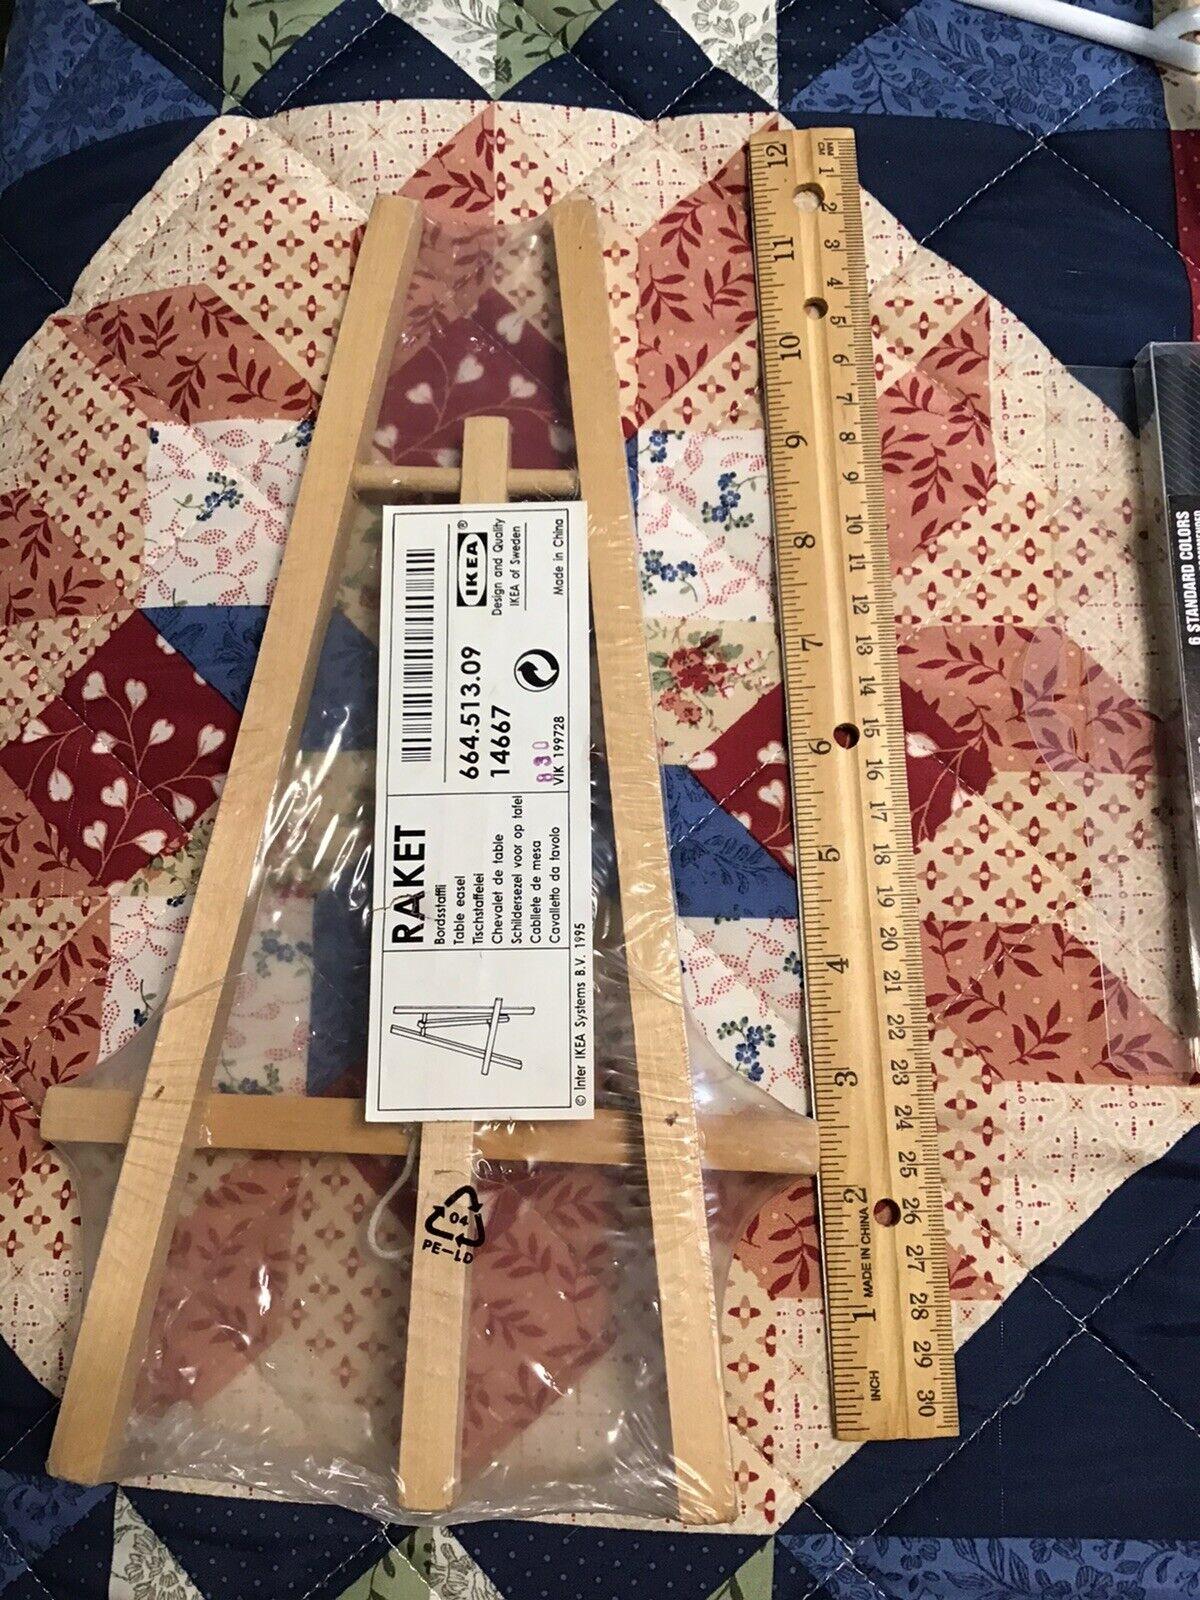 Raket Ikea Table Easel New 664 513 09 Wooden Folding 12 New Sealed For Sale Online